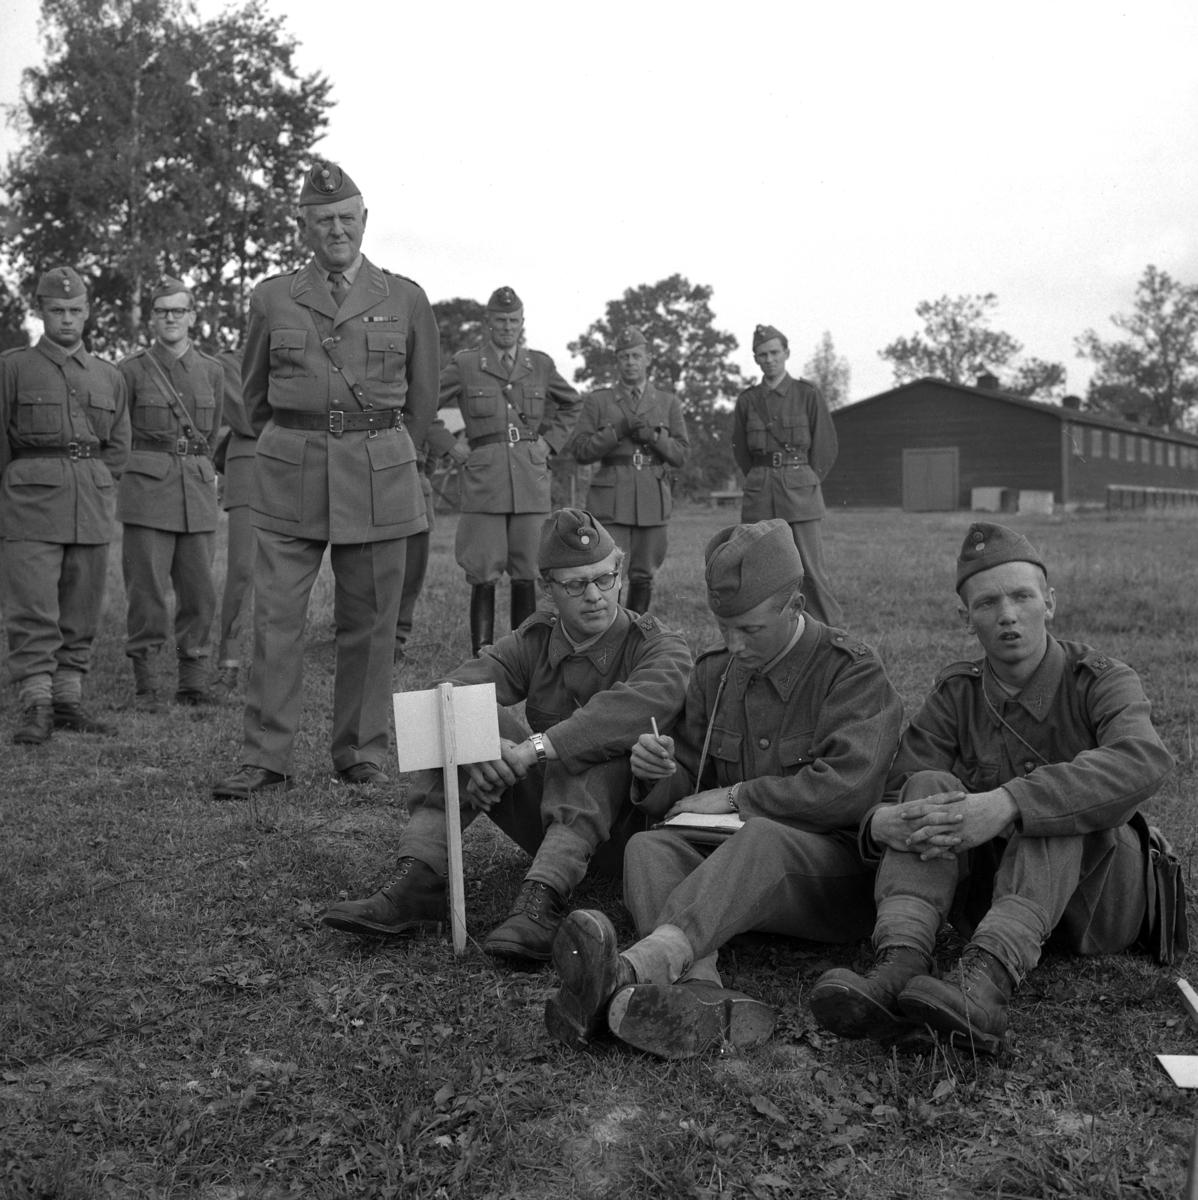 General på I3. 12 september 1955.